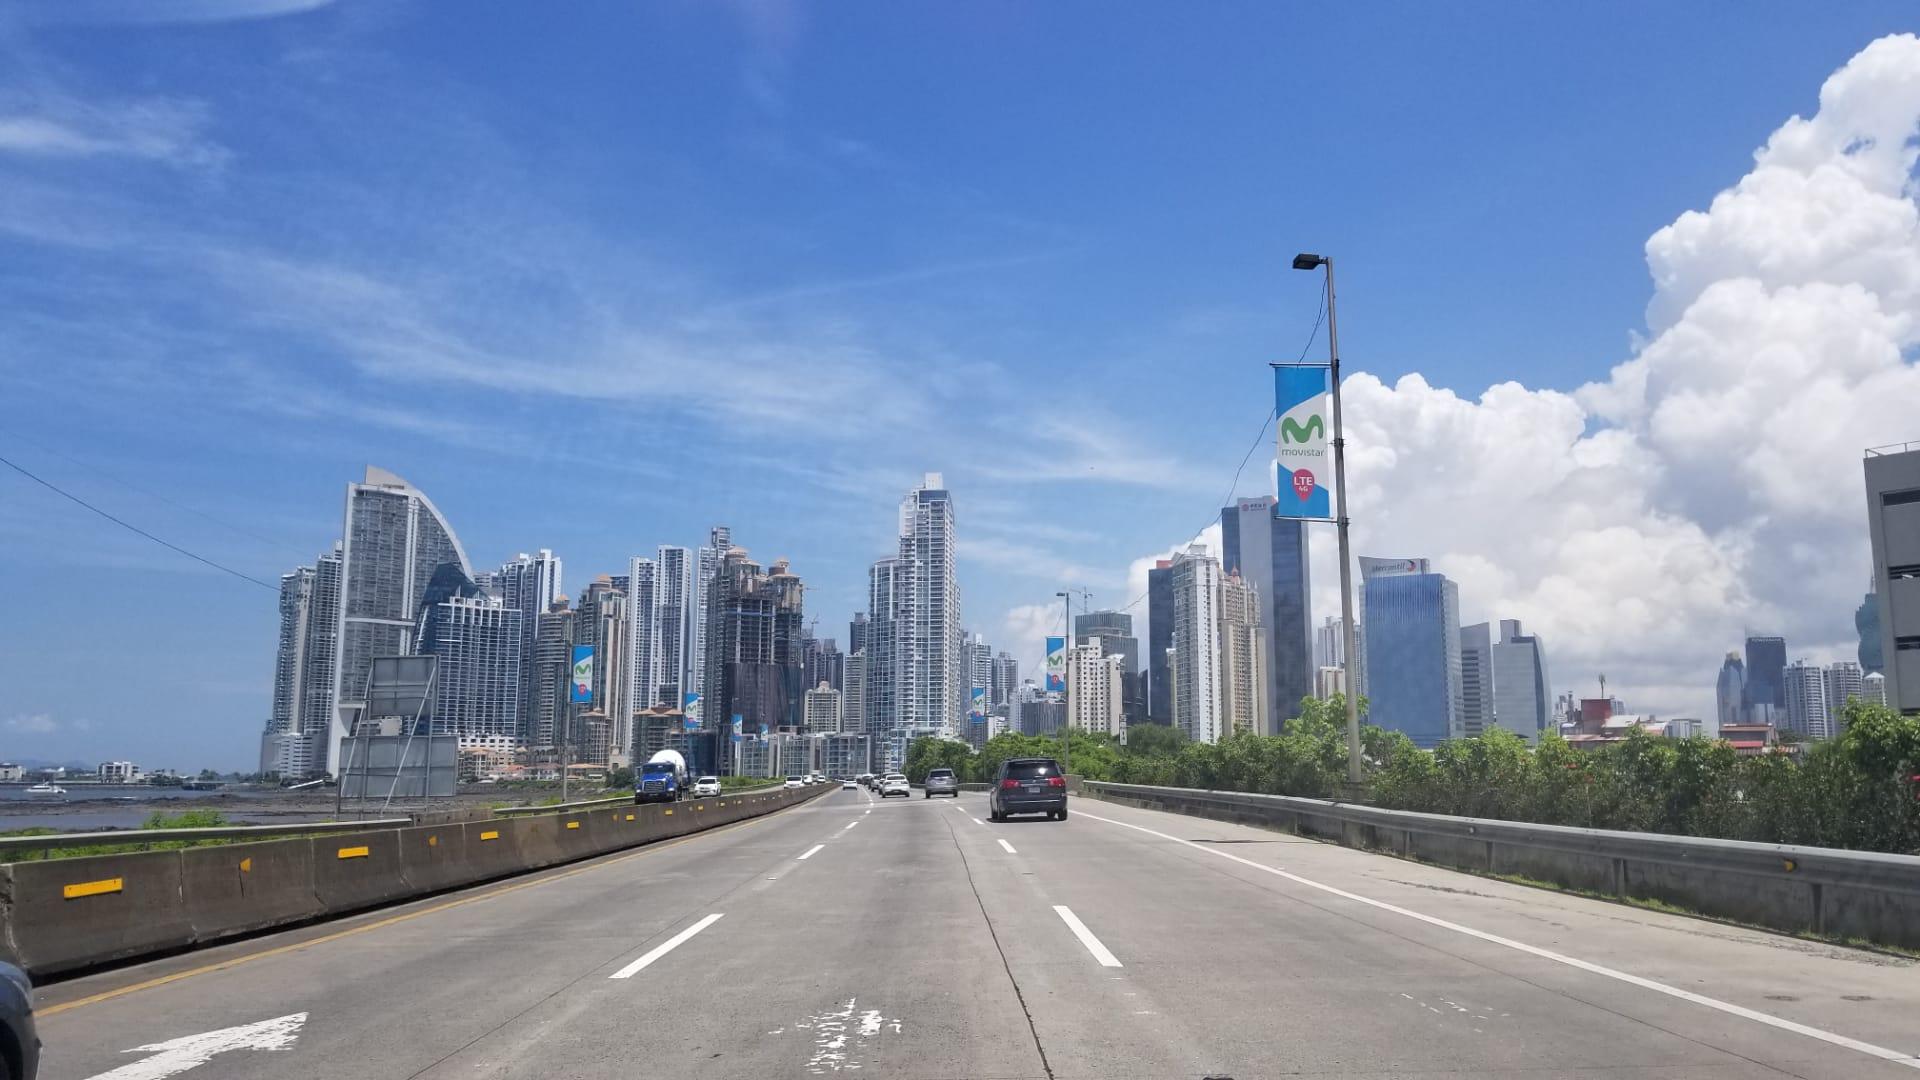 Panama CorredorSur